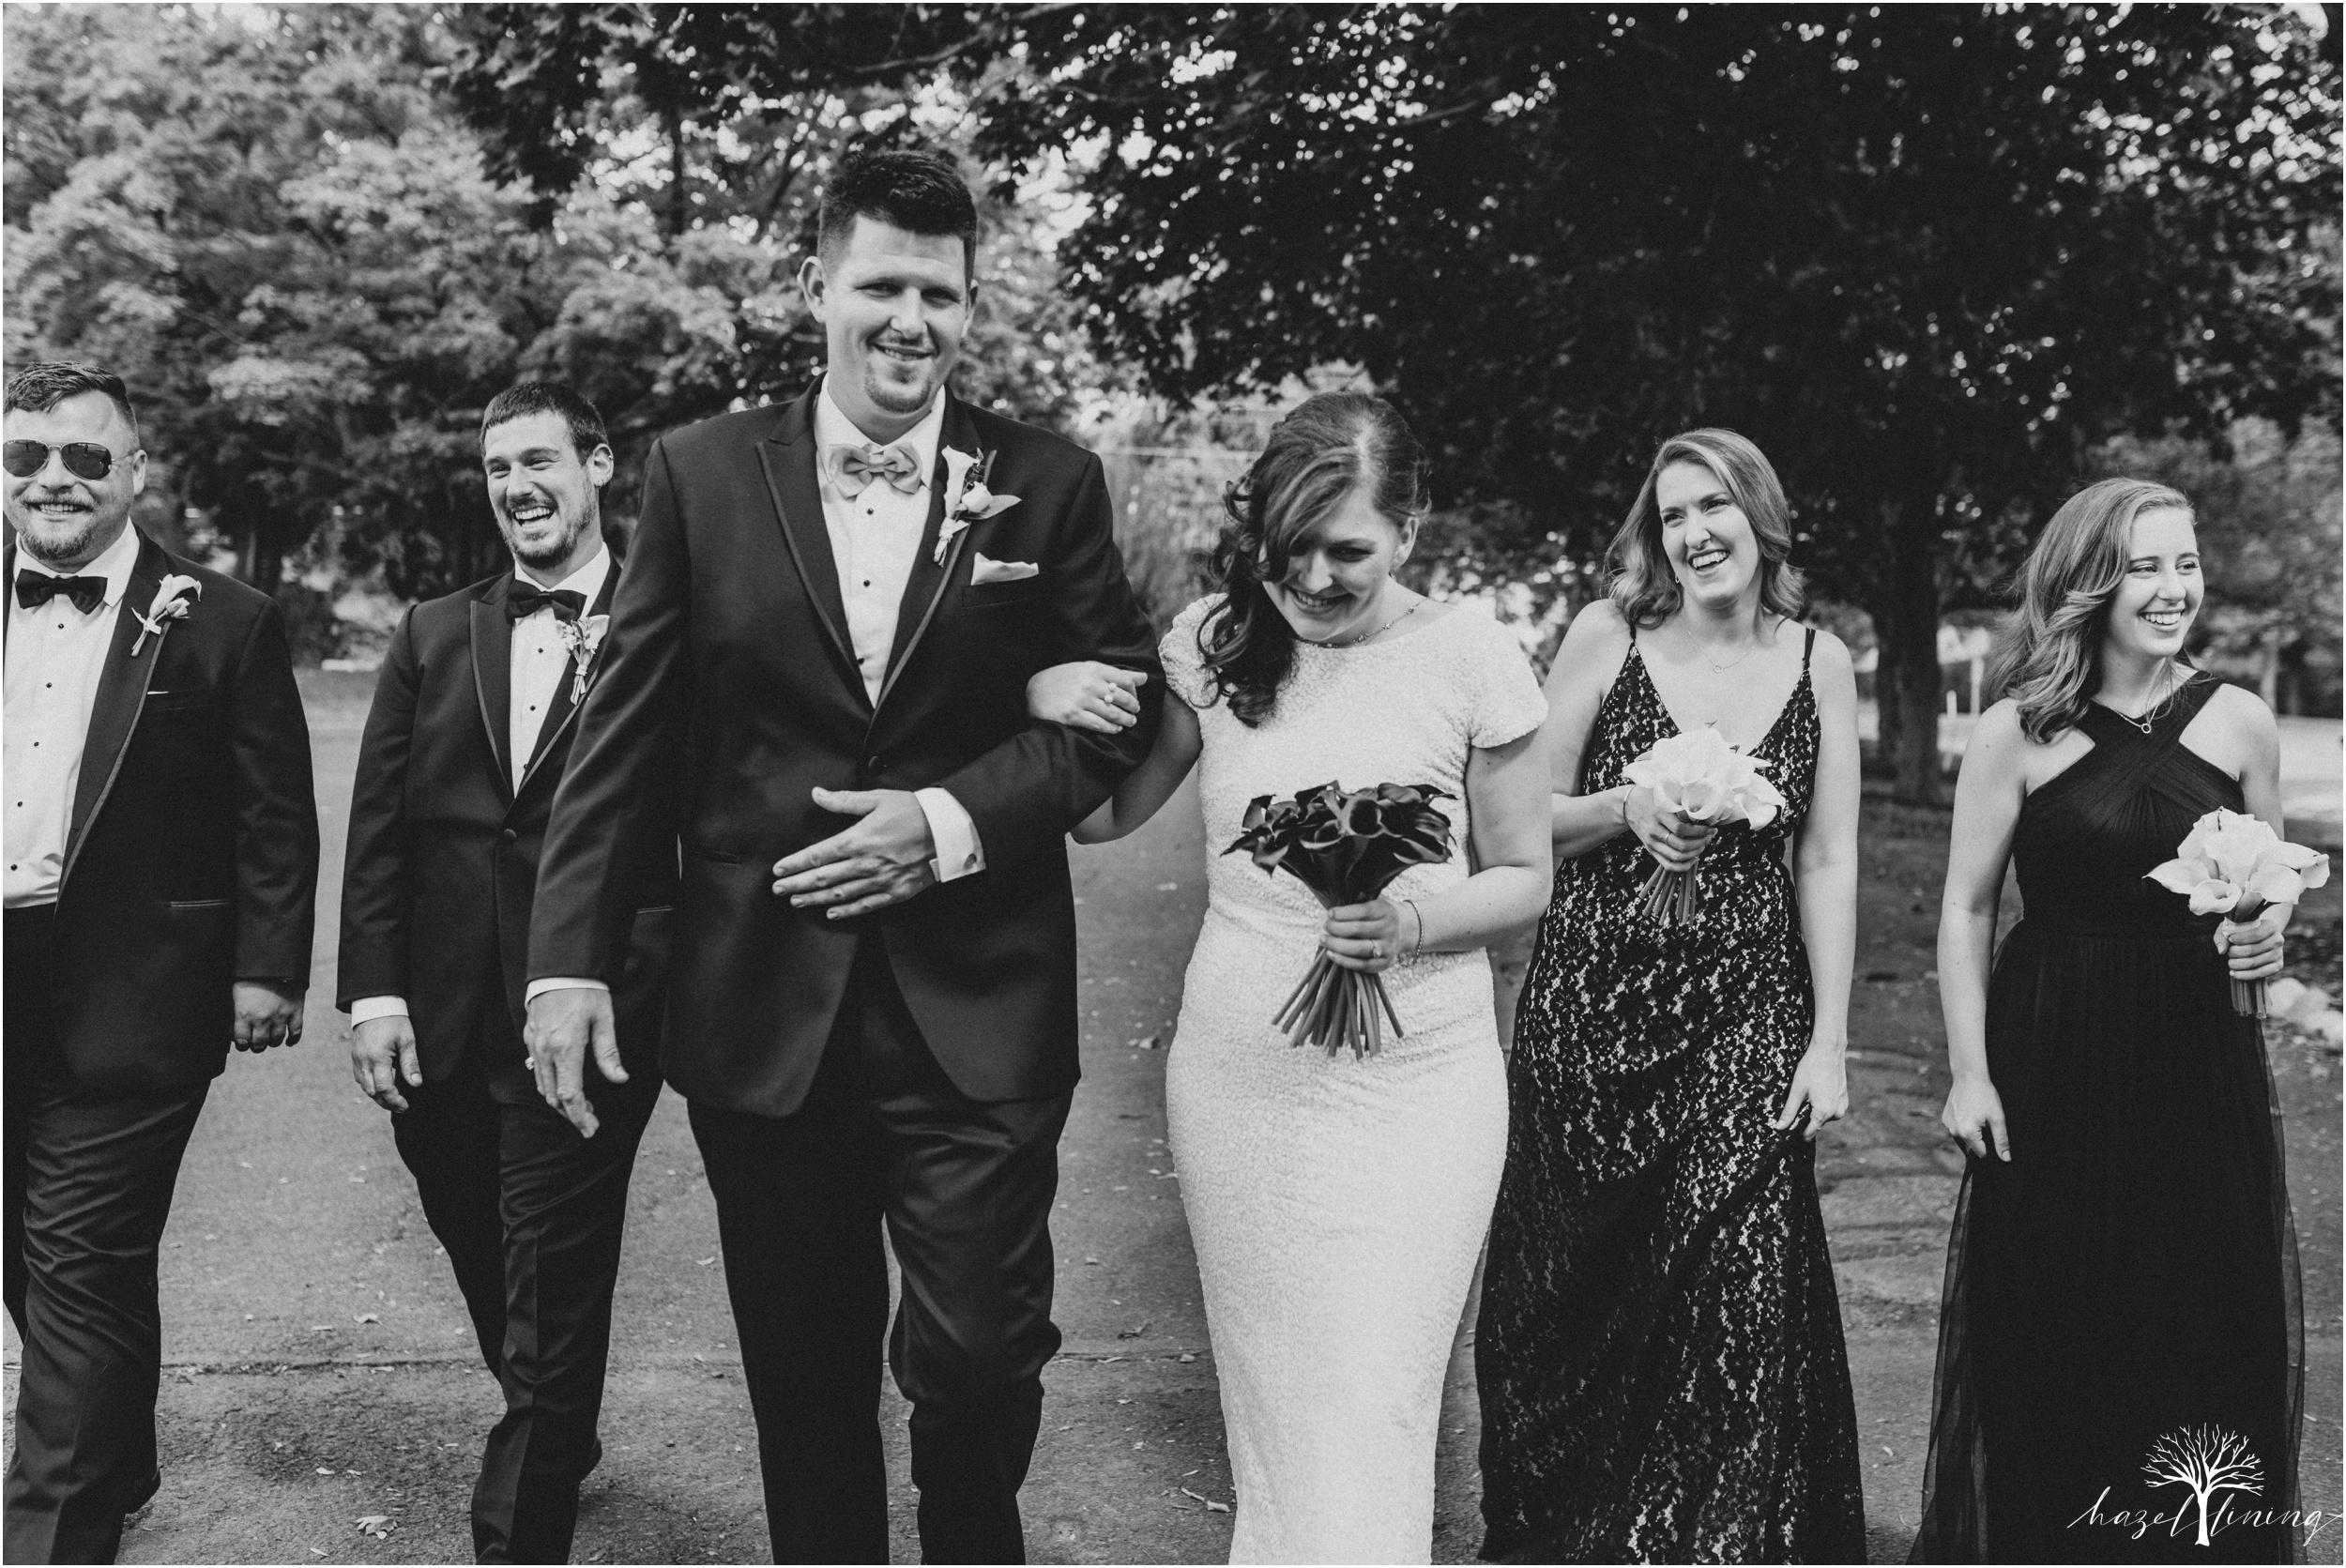 elizabeth-doelp-andrew-foreback-middletown-country-club-summer-langhorne-pennsylvania-wedding-hazel-lining-travel-wedding-elopement-photography_0082.jpg